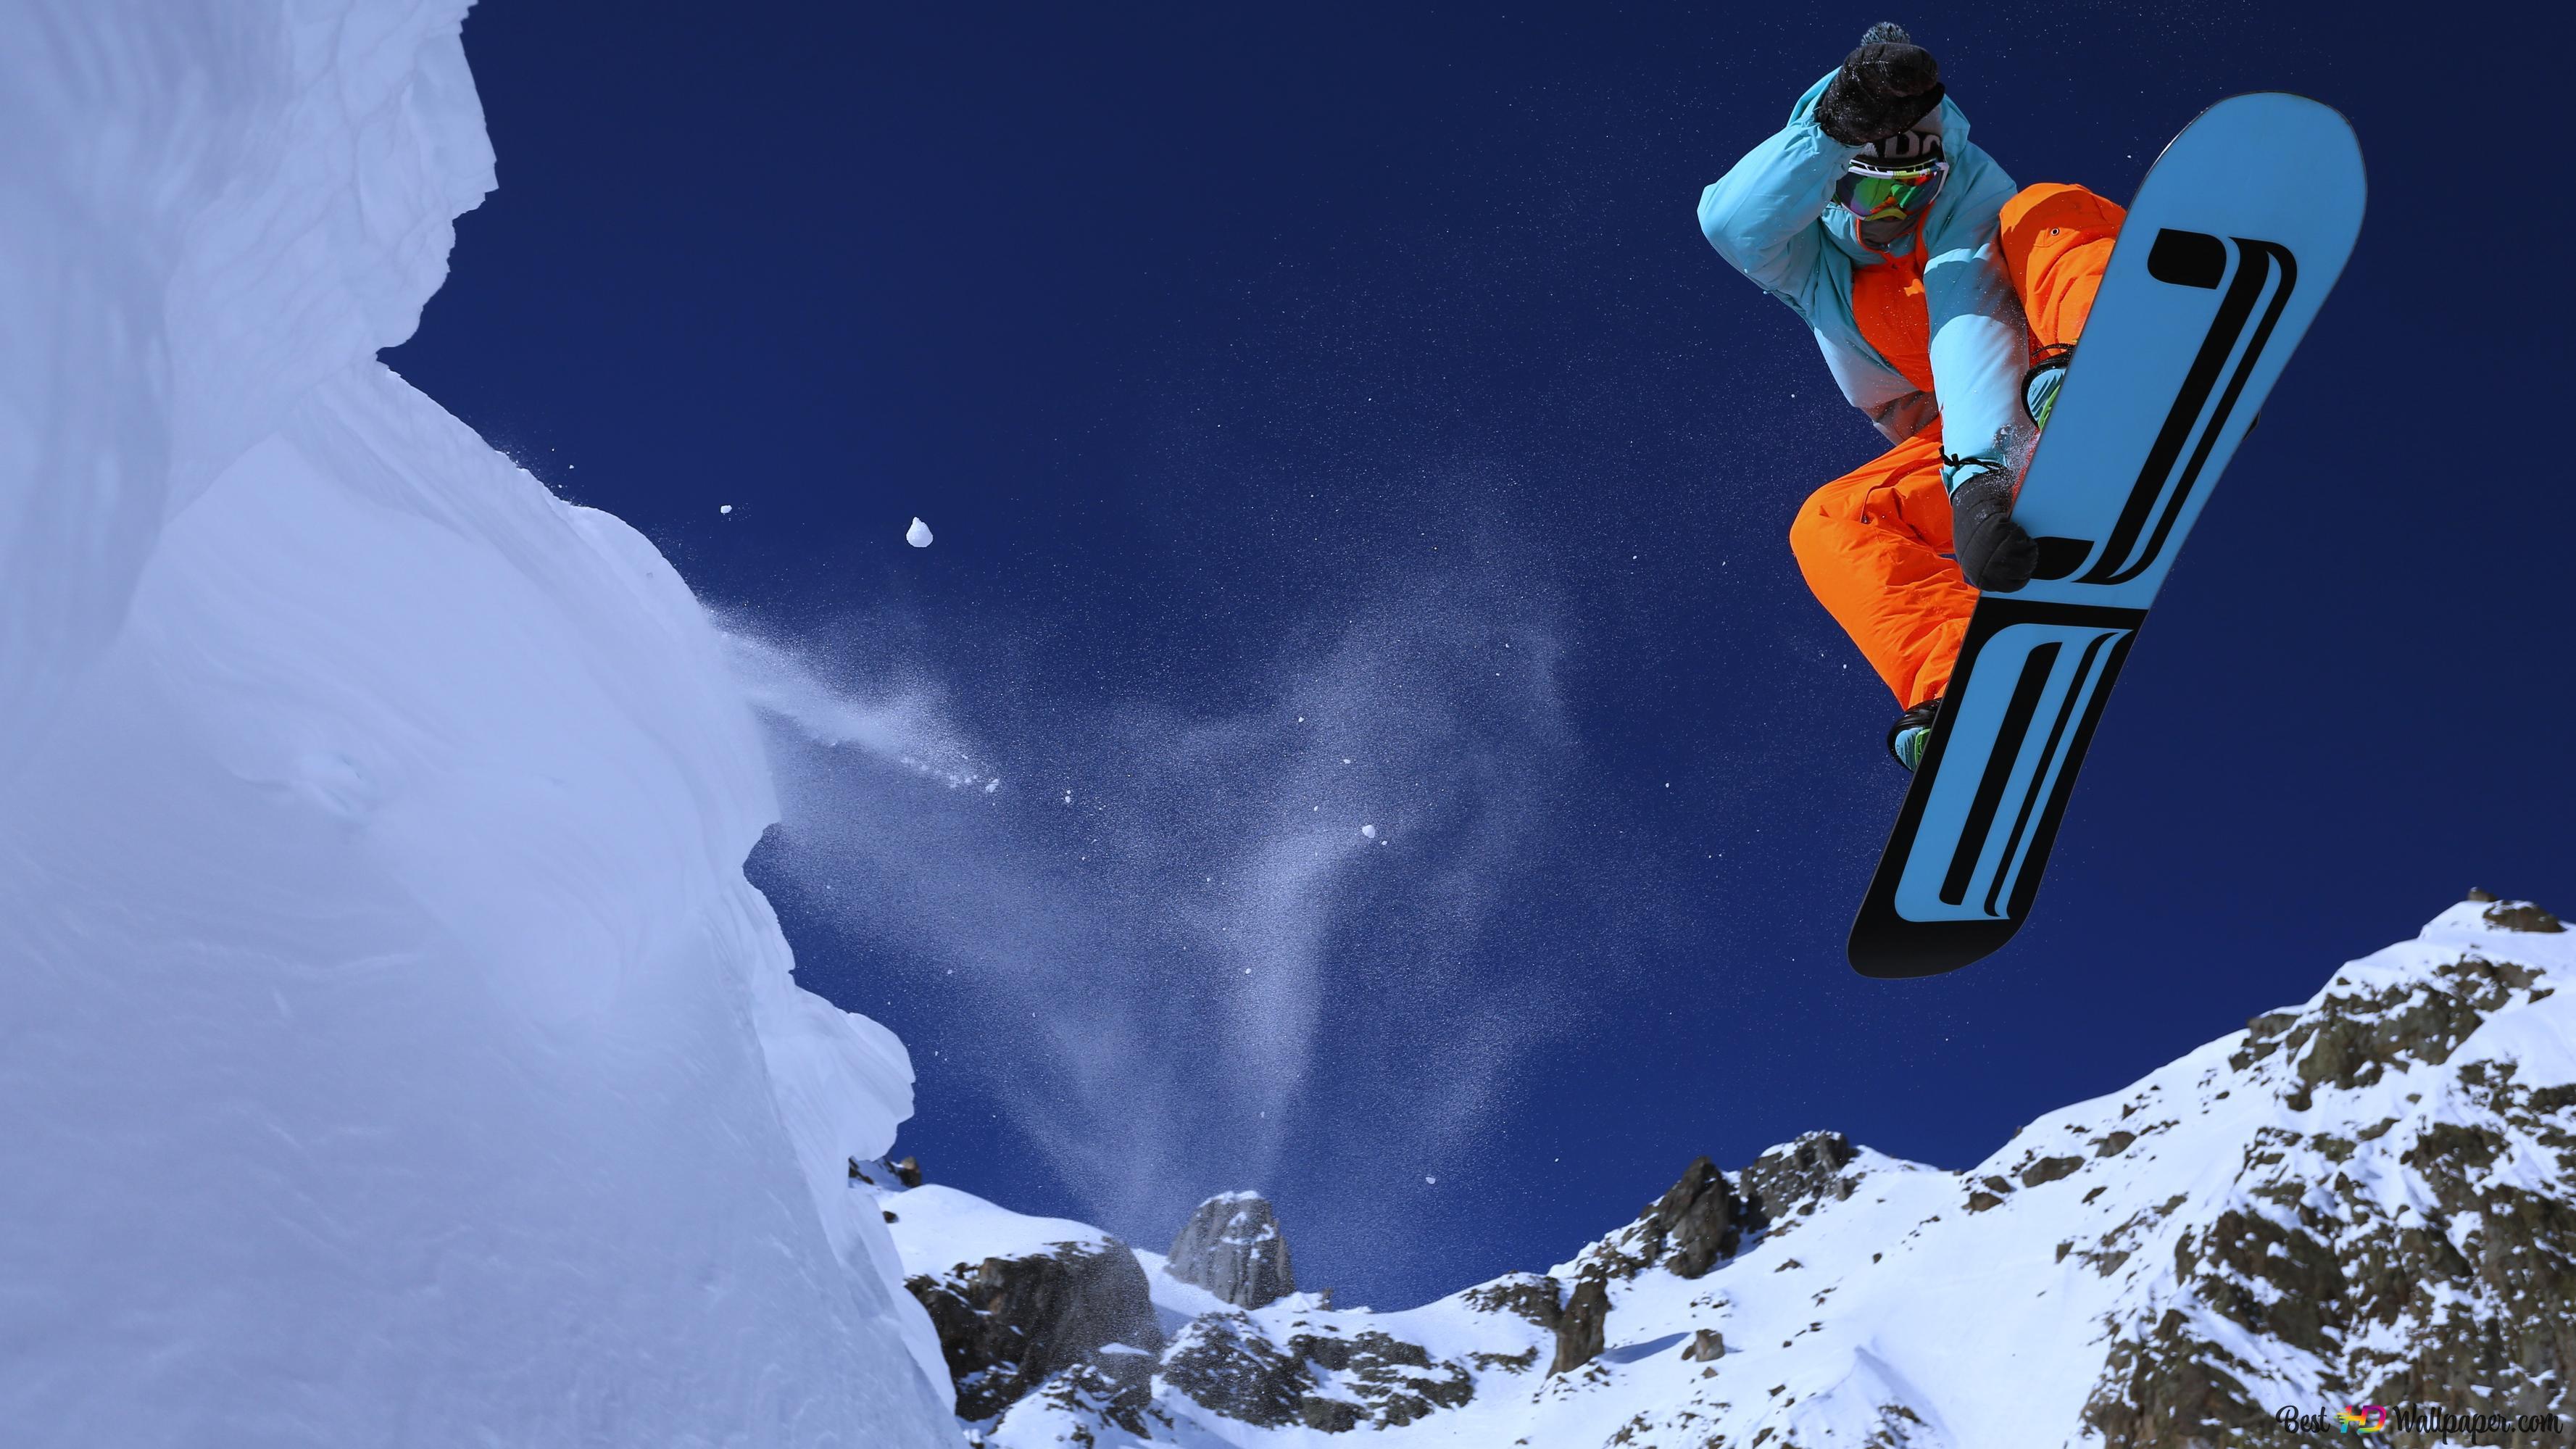 Snowboarding Hd Wallpaper Download